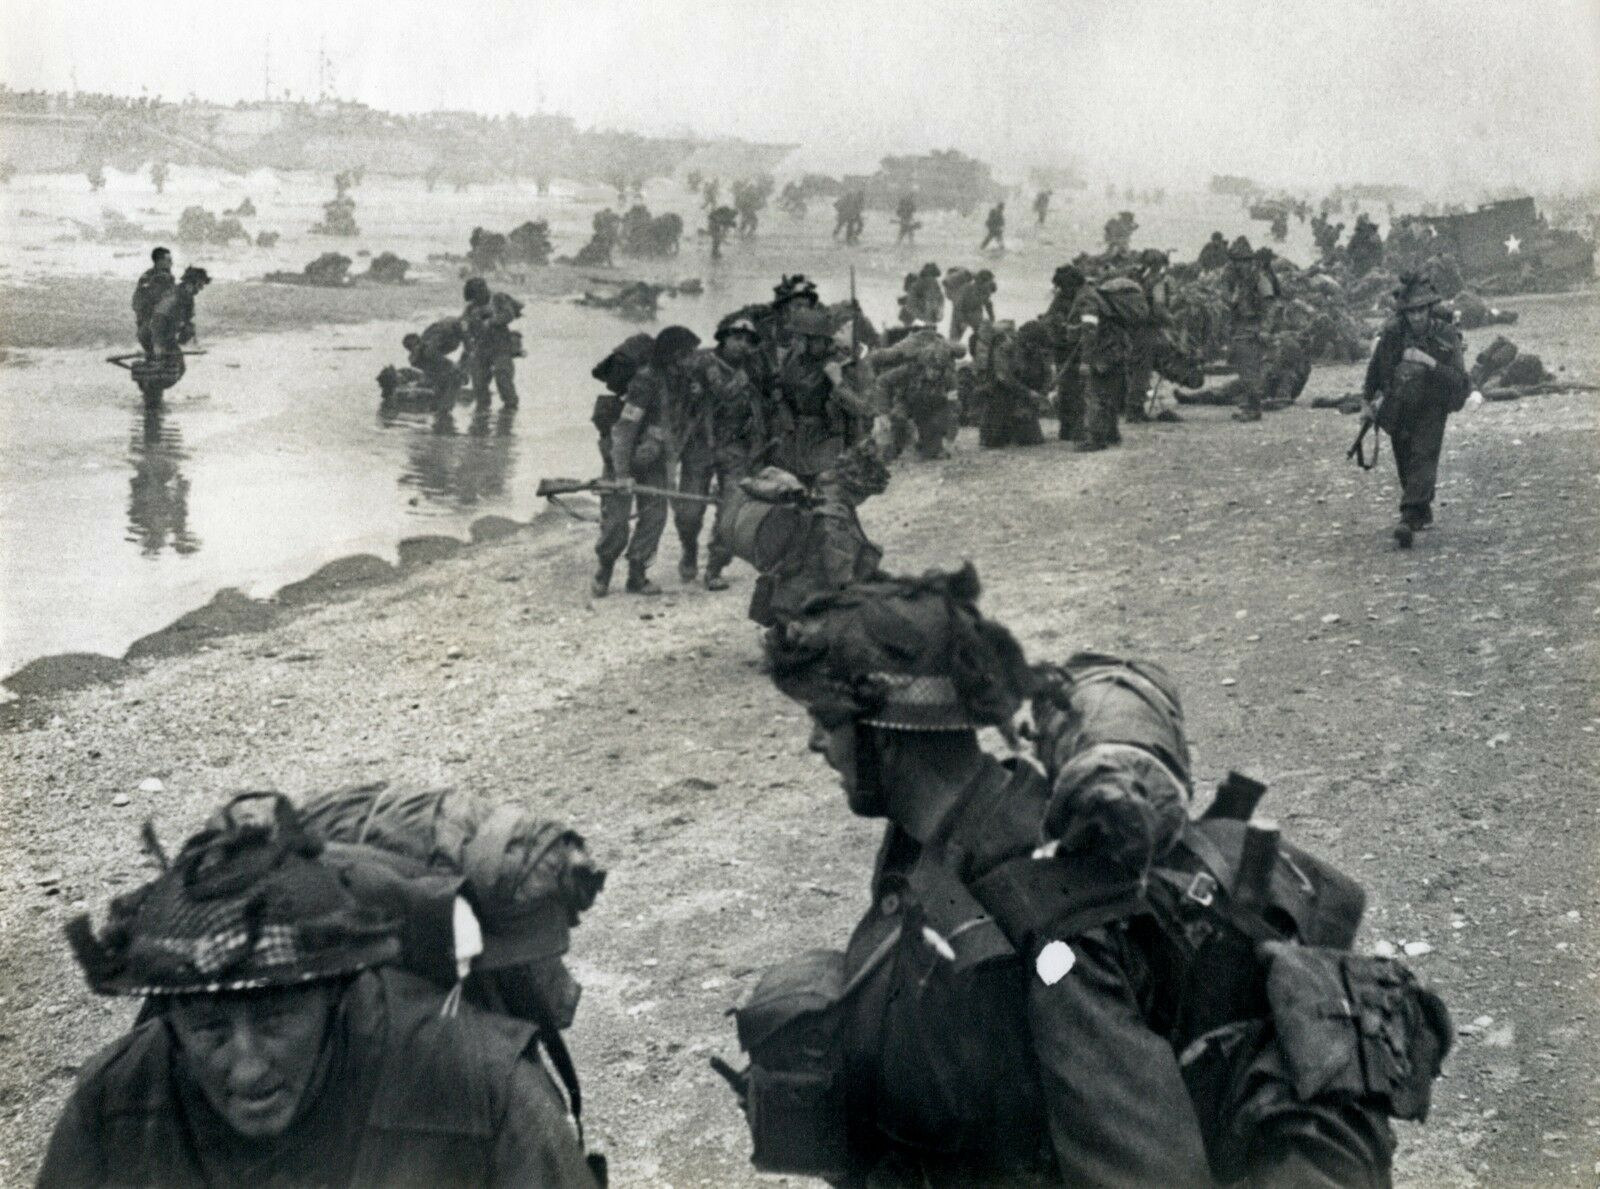 BRITISH ARMY D DAY 1944 BEACH ASSAULT    Military Photo Print